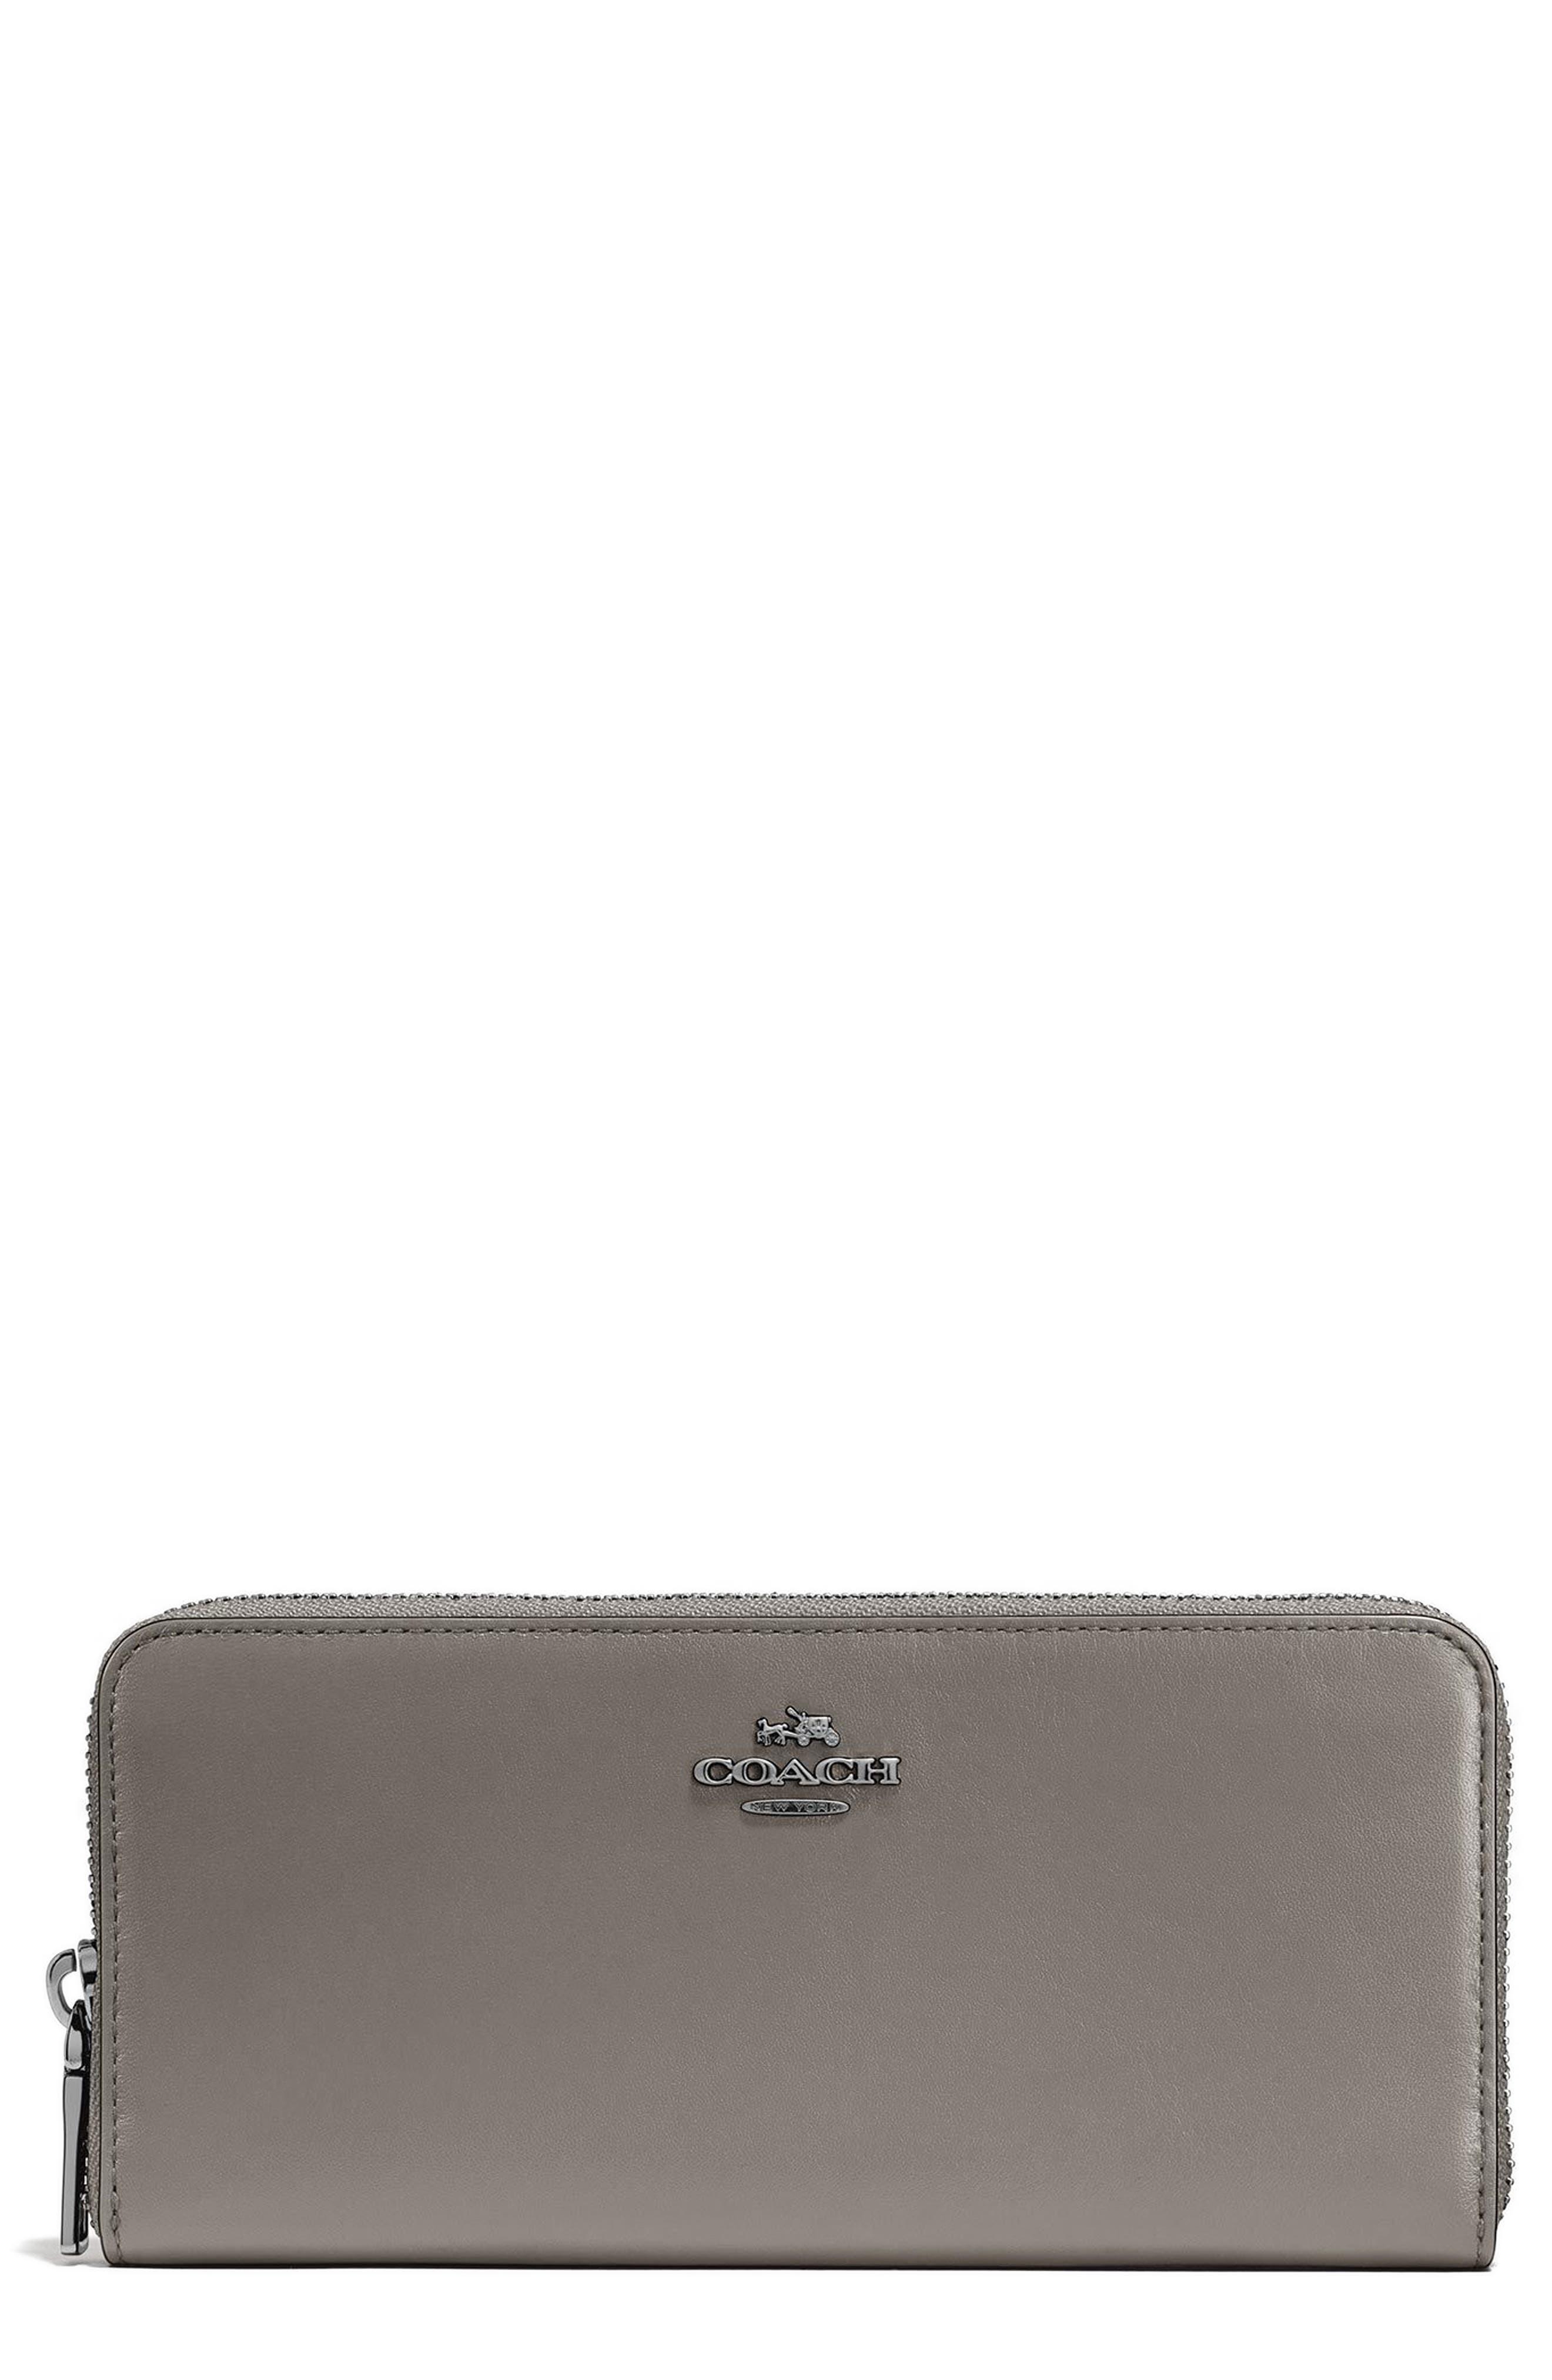 Accordion Zip Around Leather Wallet,                         Main,                         color, Heather Grey